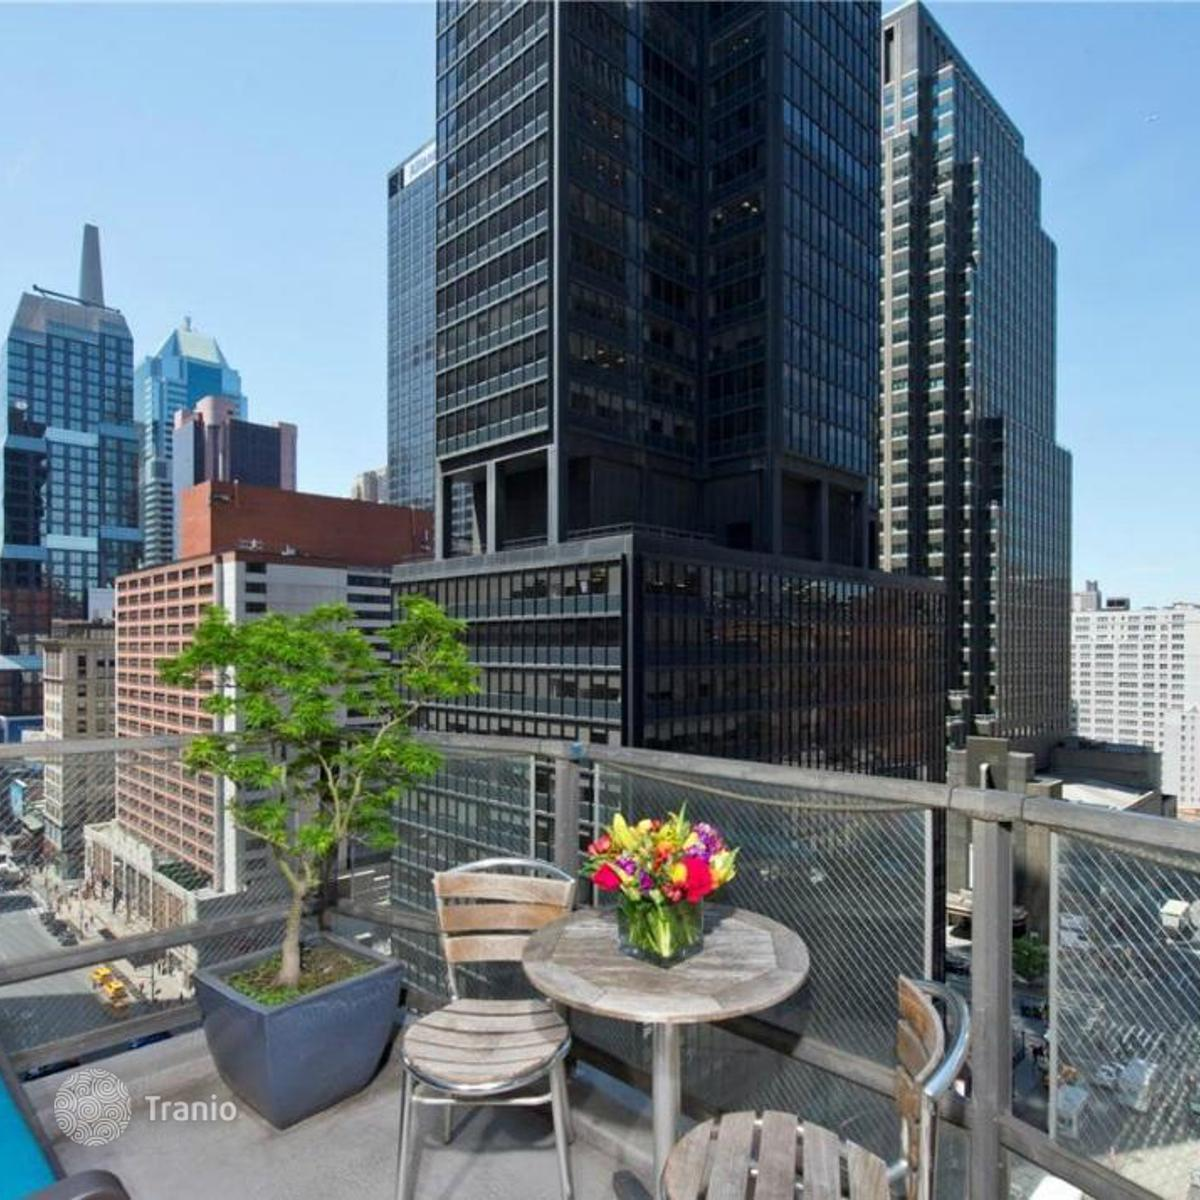 Apartments Nyc Manhattan: Listing #1446610 In Midtown Manhattan, Manhattan, New York